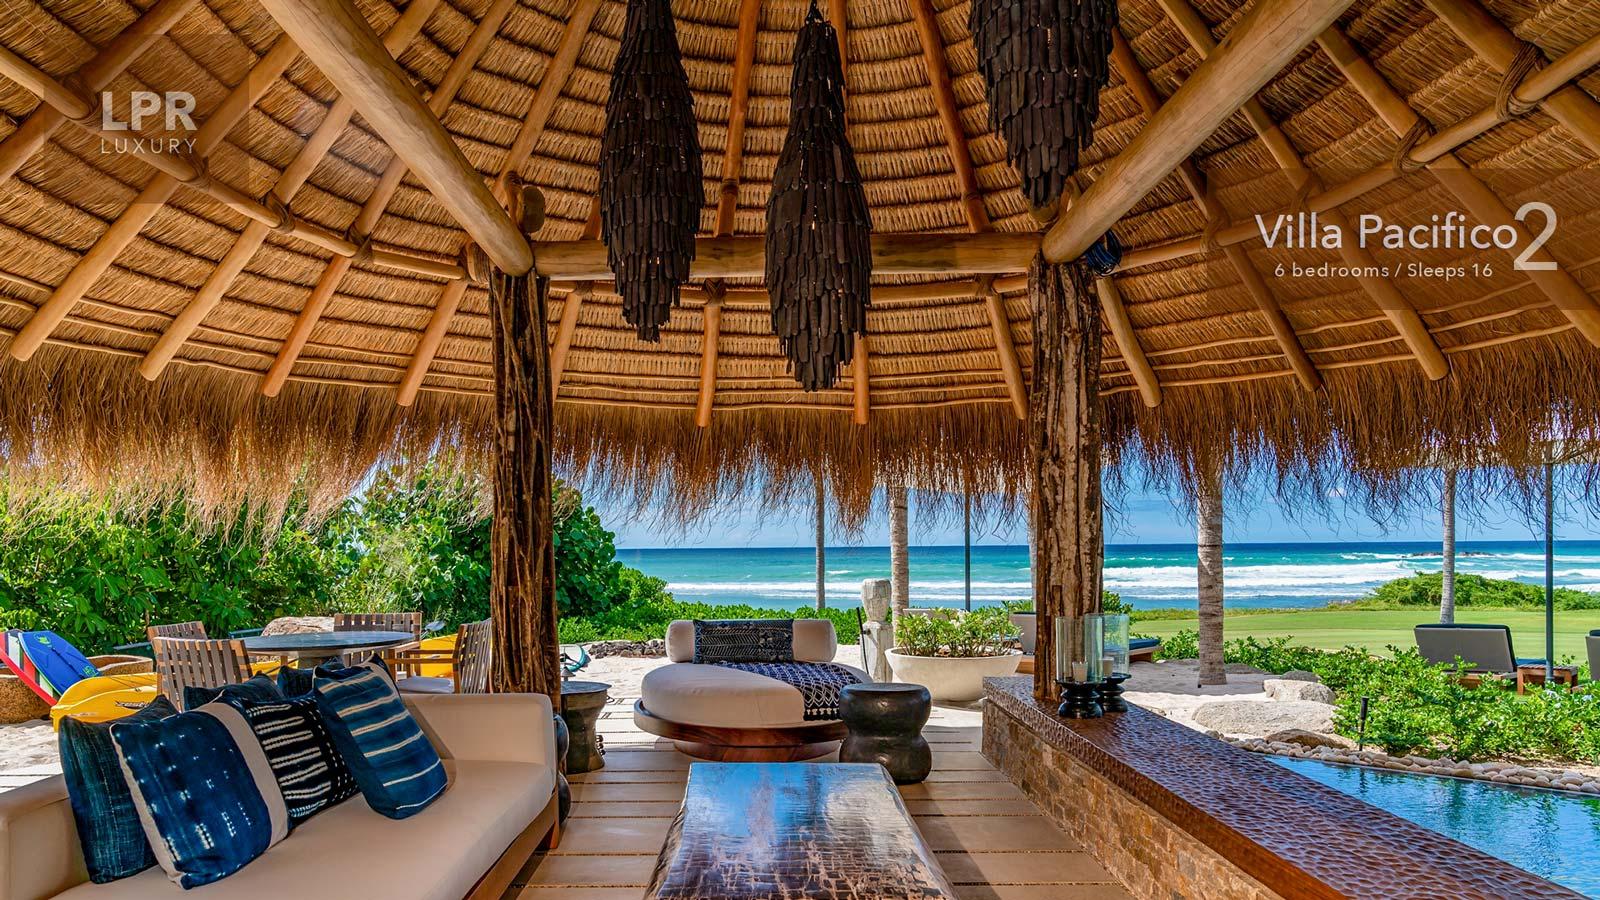 Villa Pacifico 2 - Luxury beachfront vacation rental villa next to the St. Regis at the Punta Mita Resort, Riviera Nayarit, Mexico